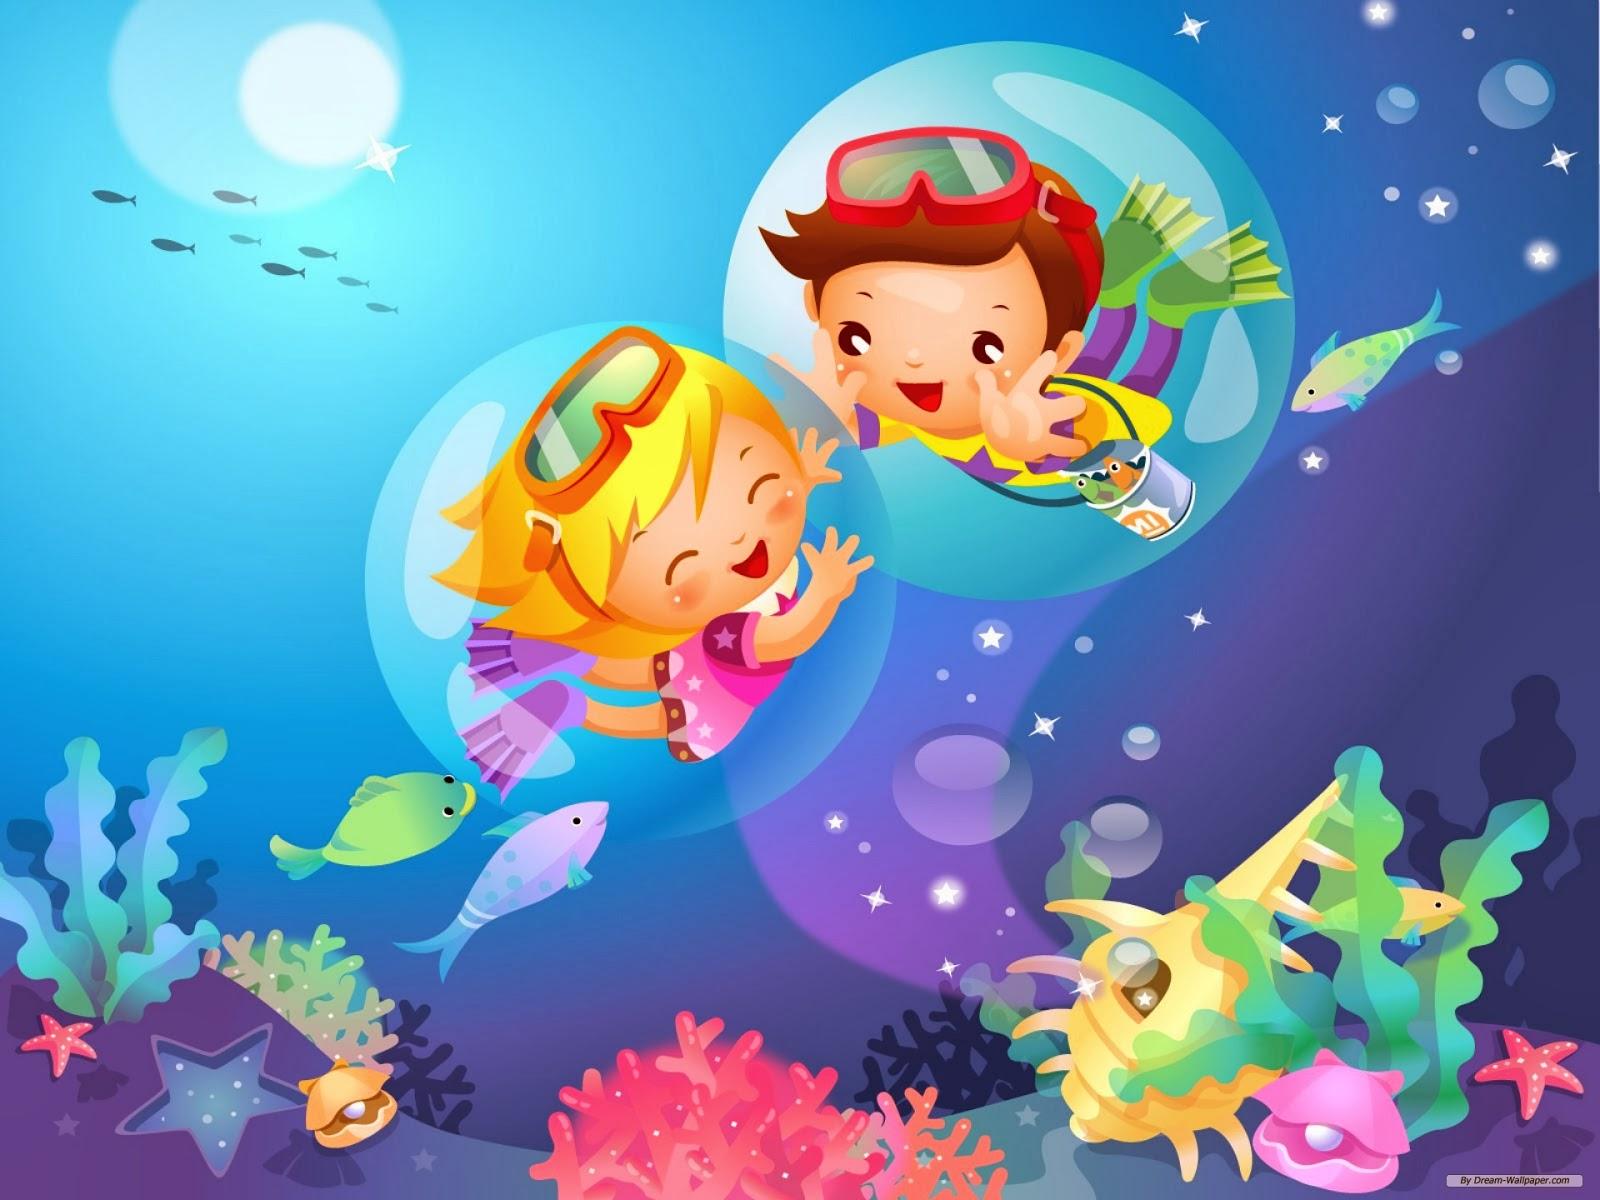 Gallery For gt Kids Wallpaper Desktop 1600x1200